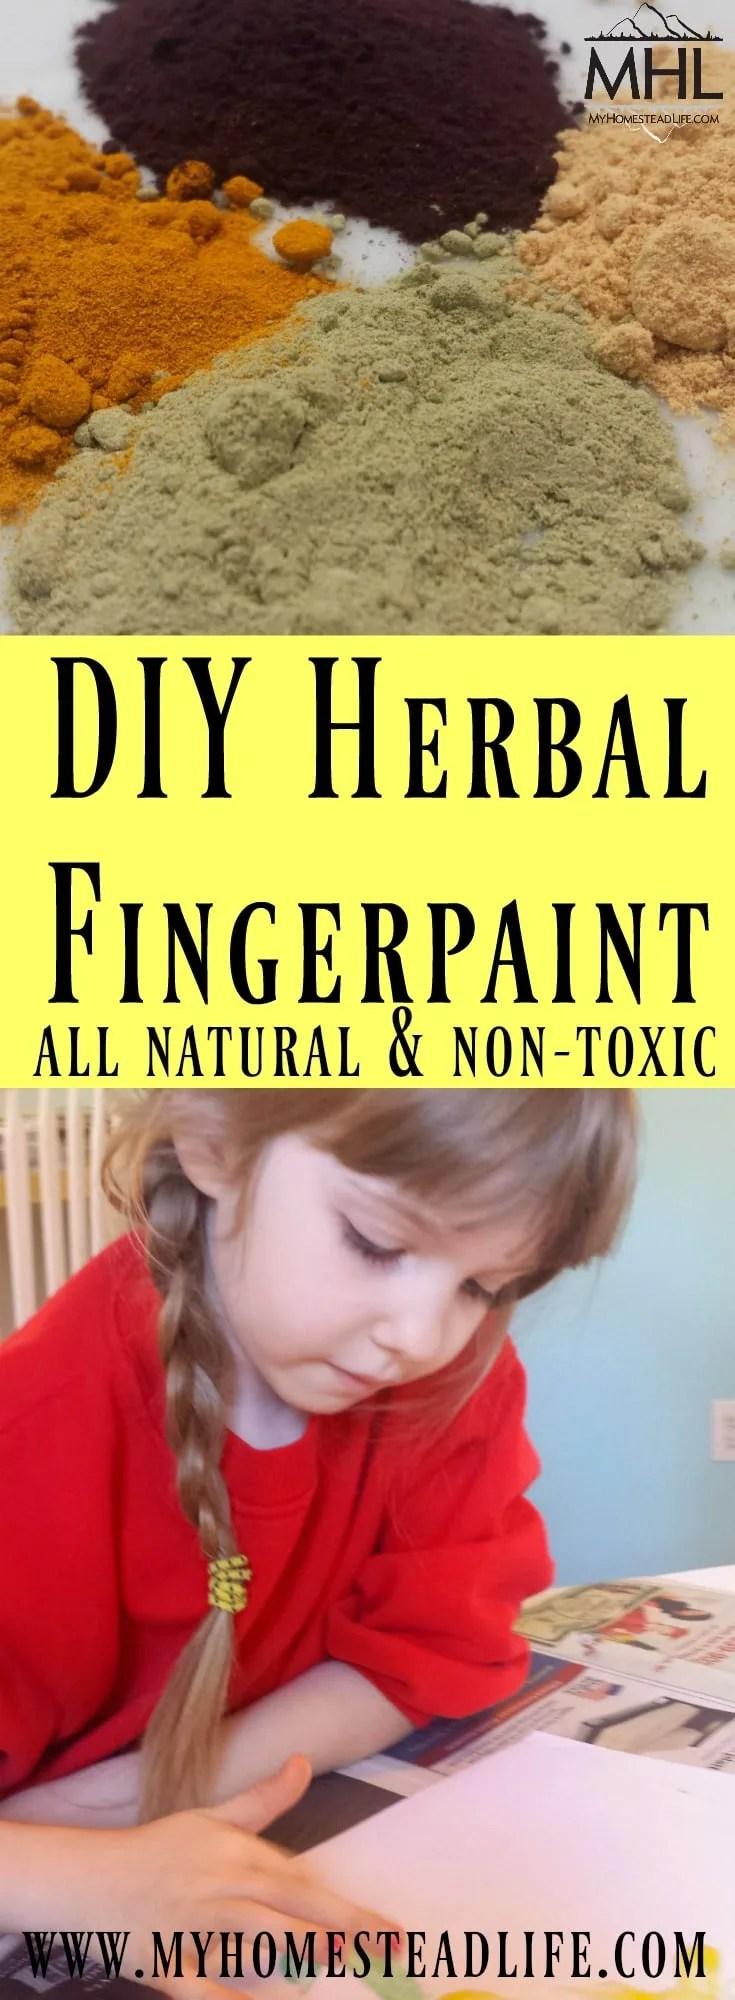 DIY Herbal Fingerpaint recipe.